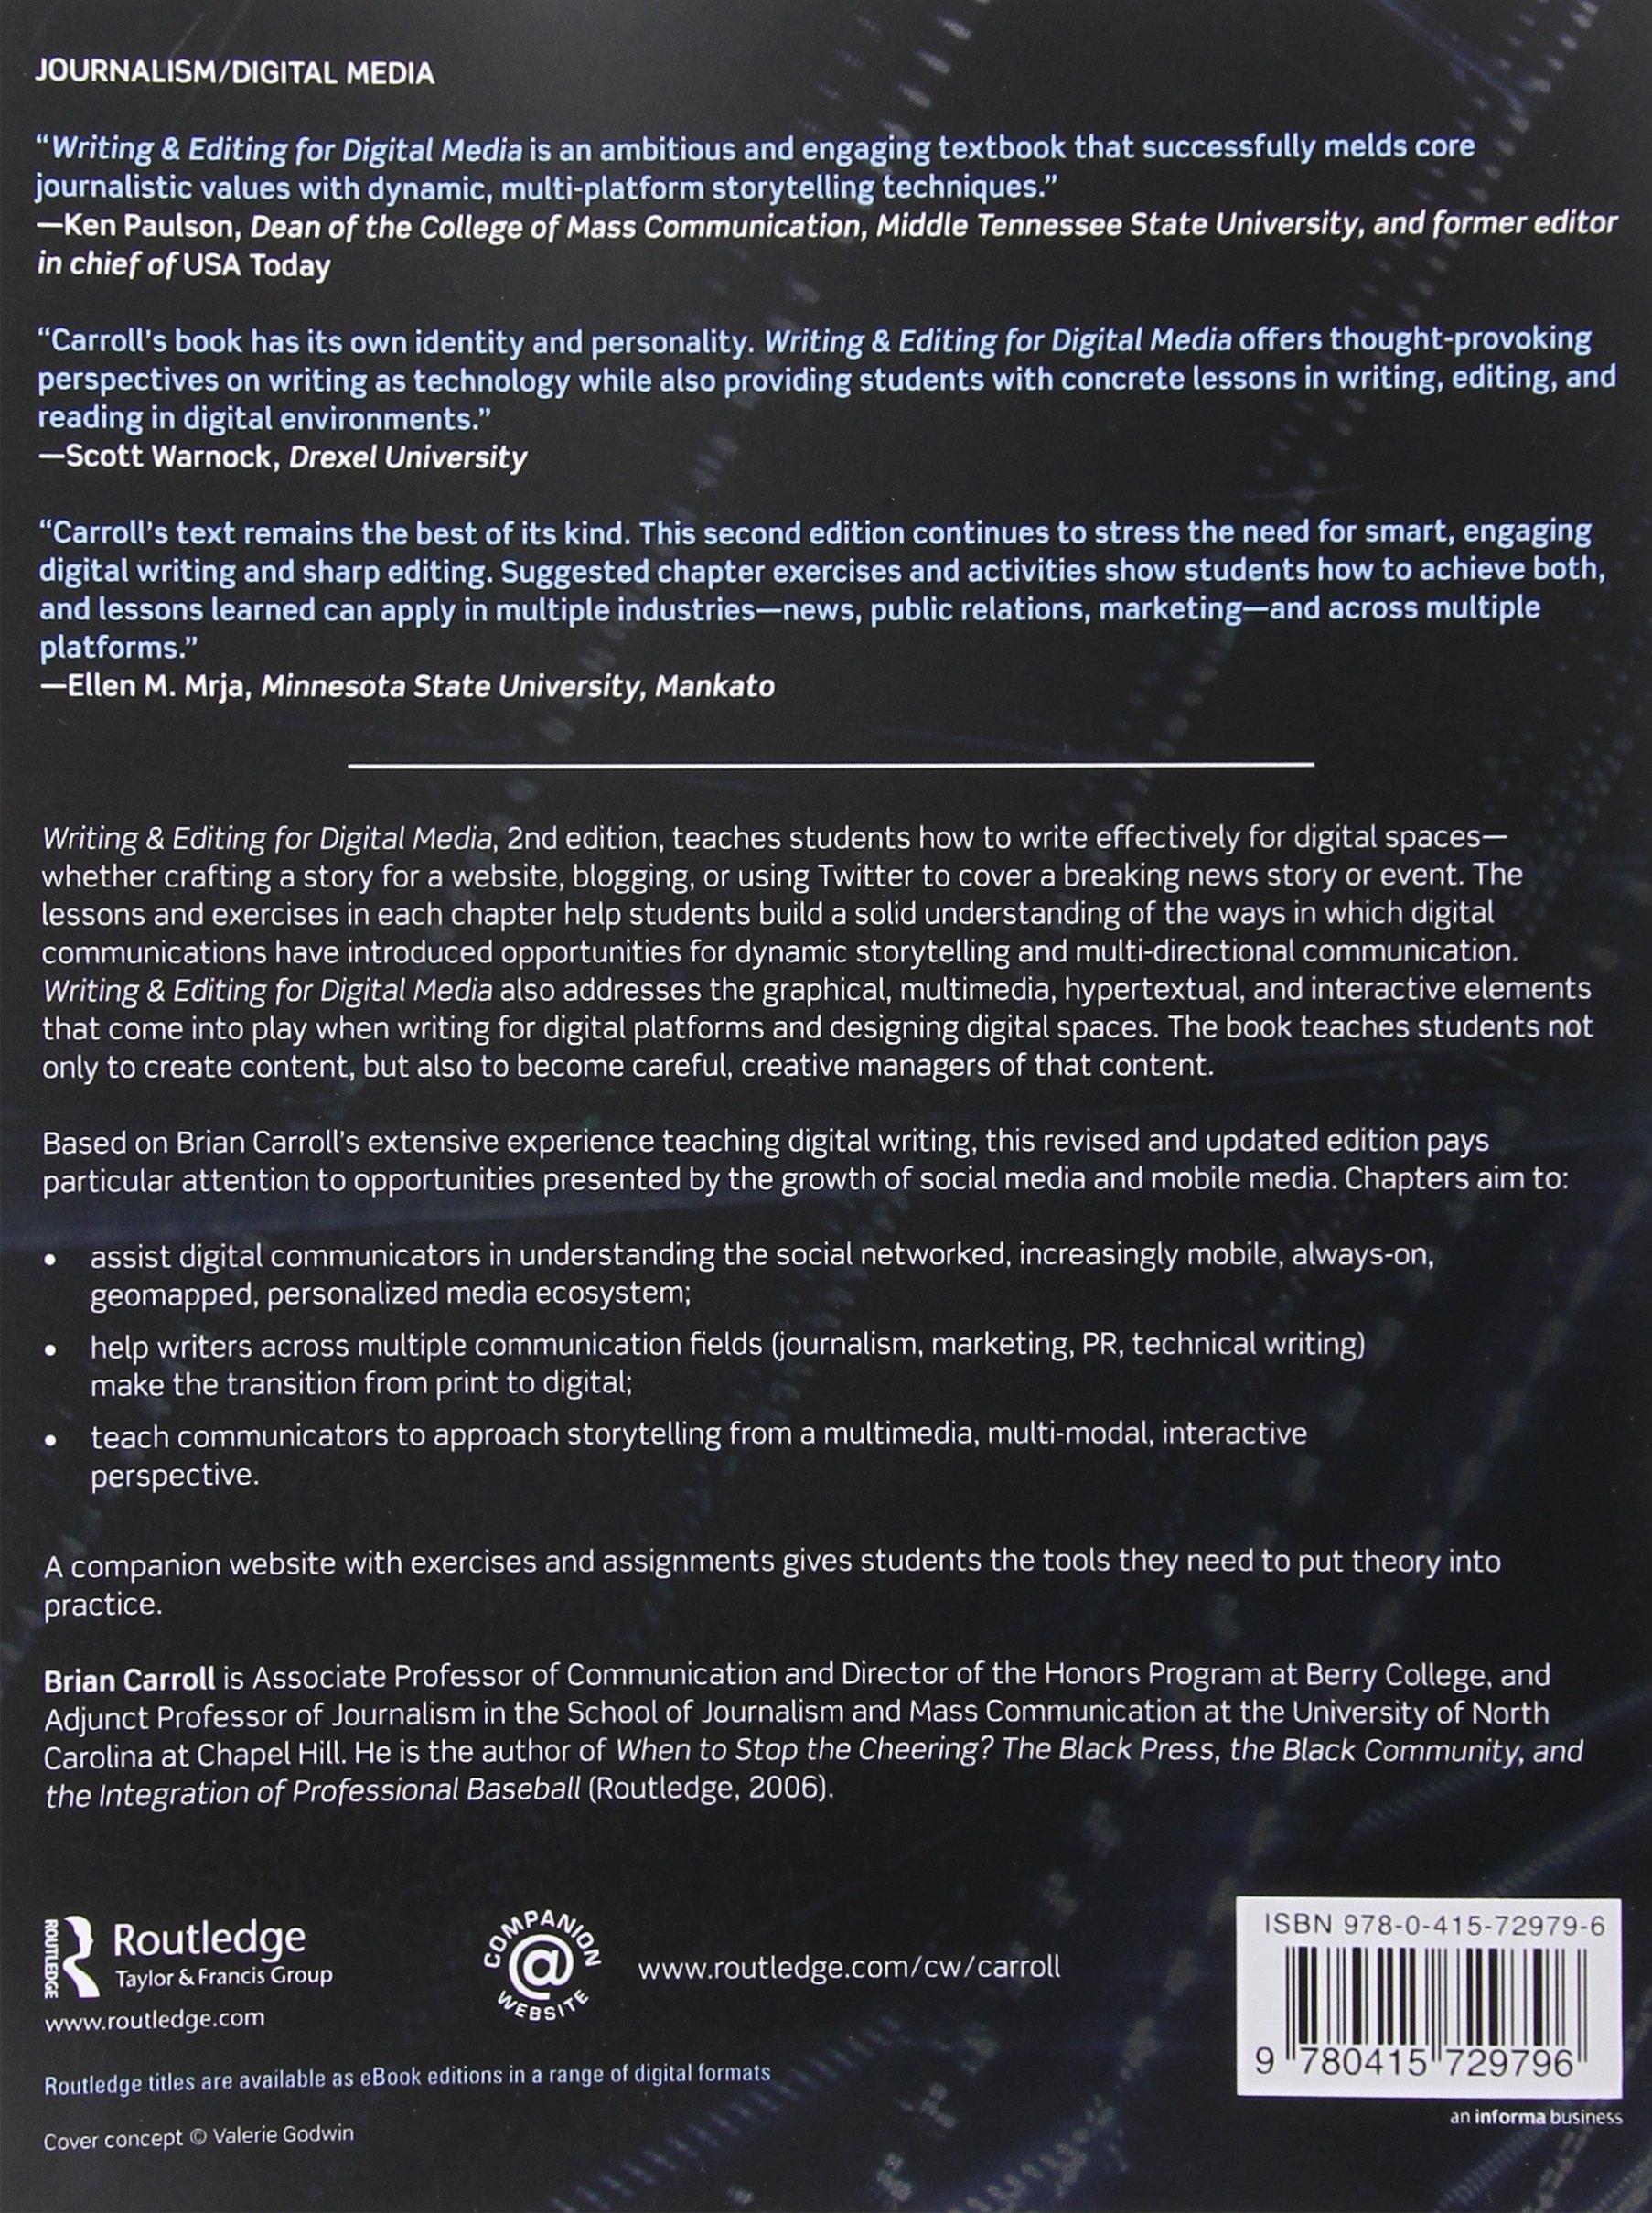 Writing and Editing for Digital Media: Amazon.co.uk: Brian Carroll:  9780415729796: Books